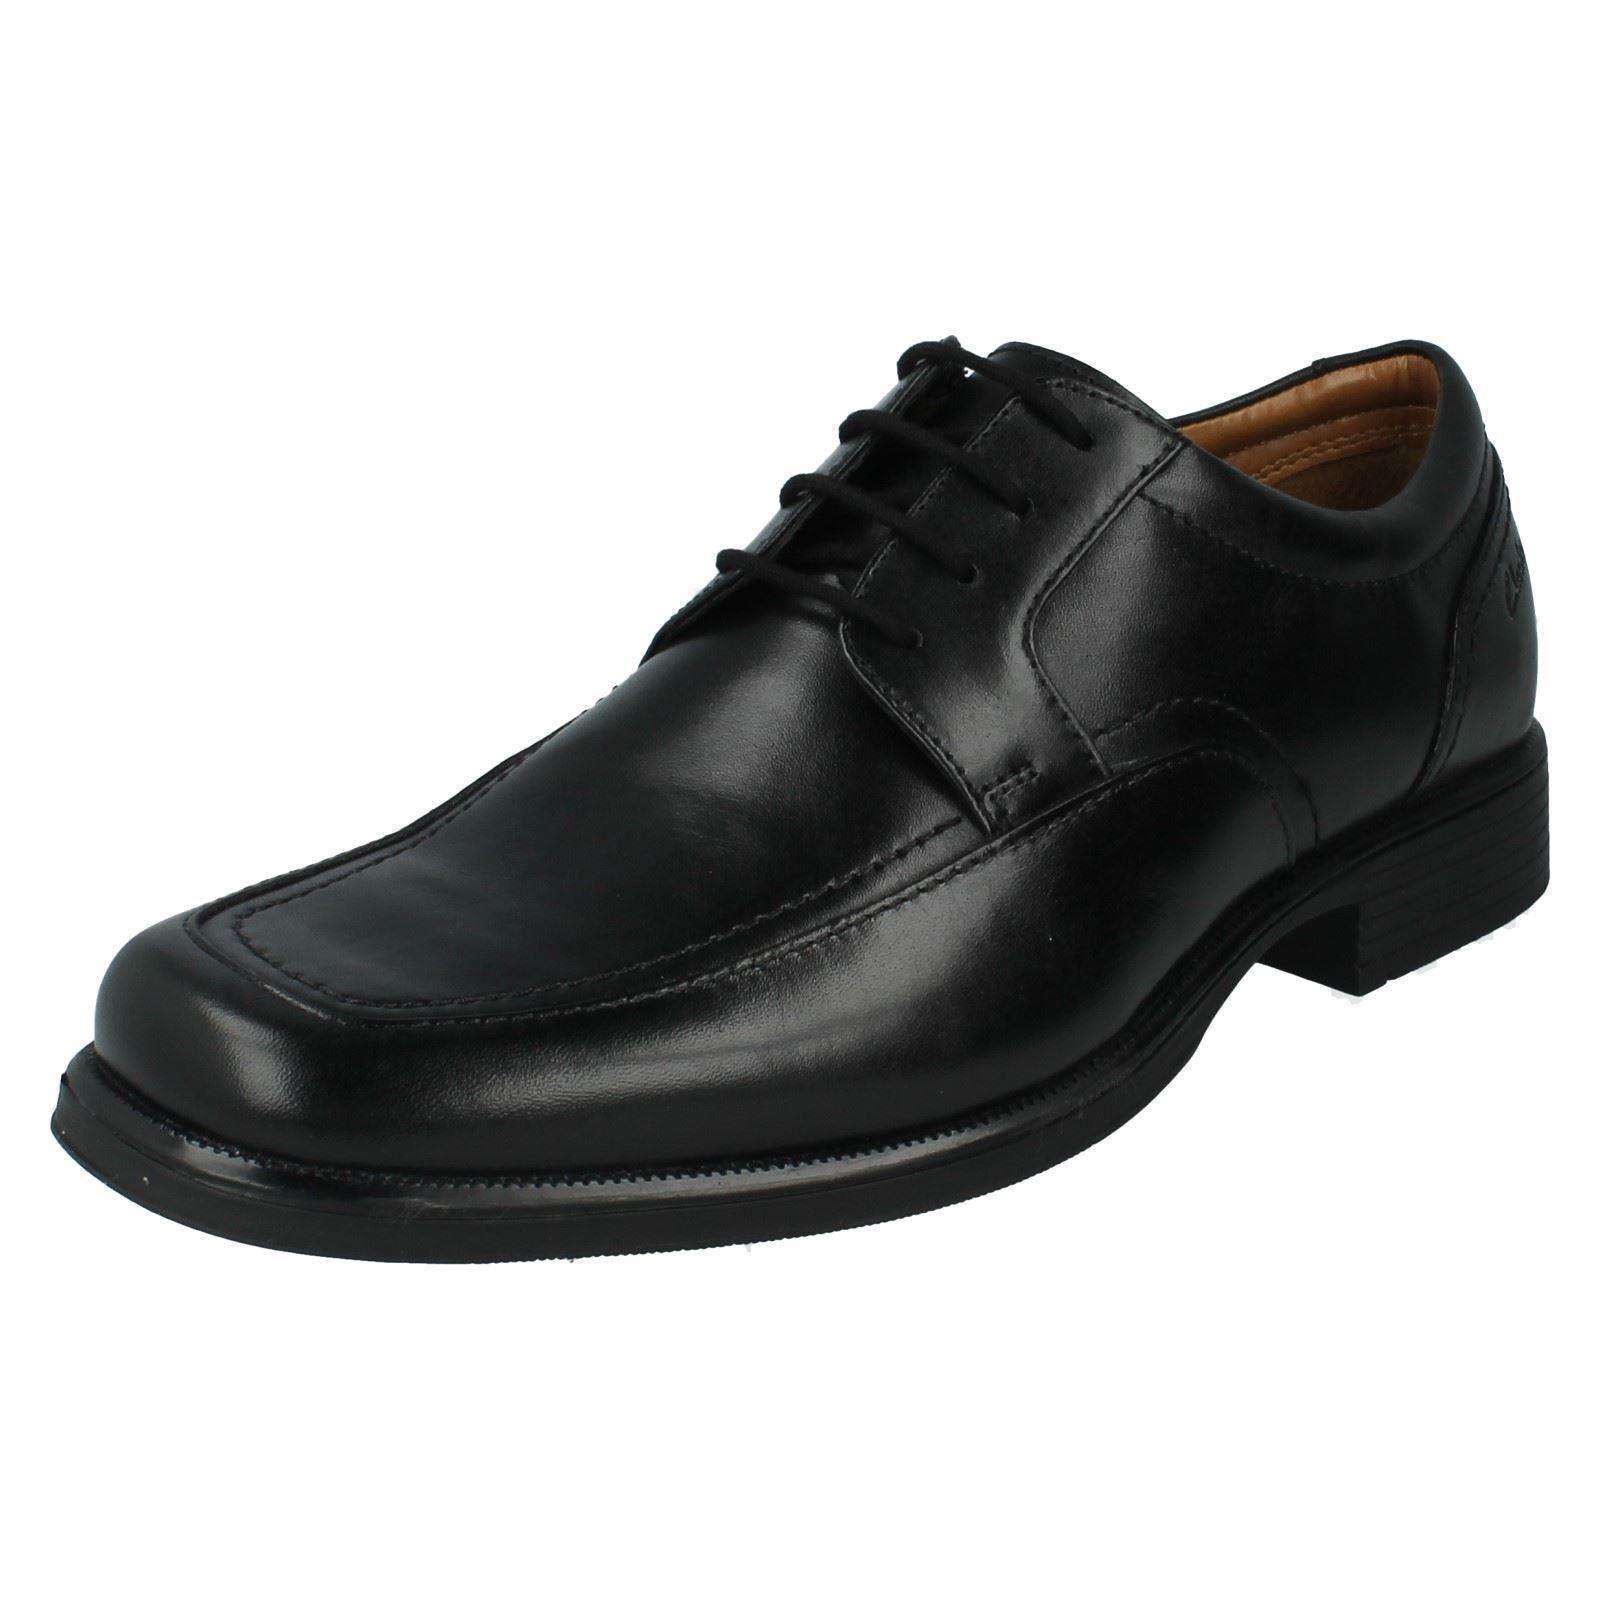 SALE Herren Clarks huckley Spring schwarze geschnürte Leder Smart formaler